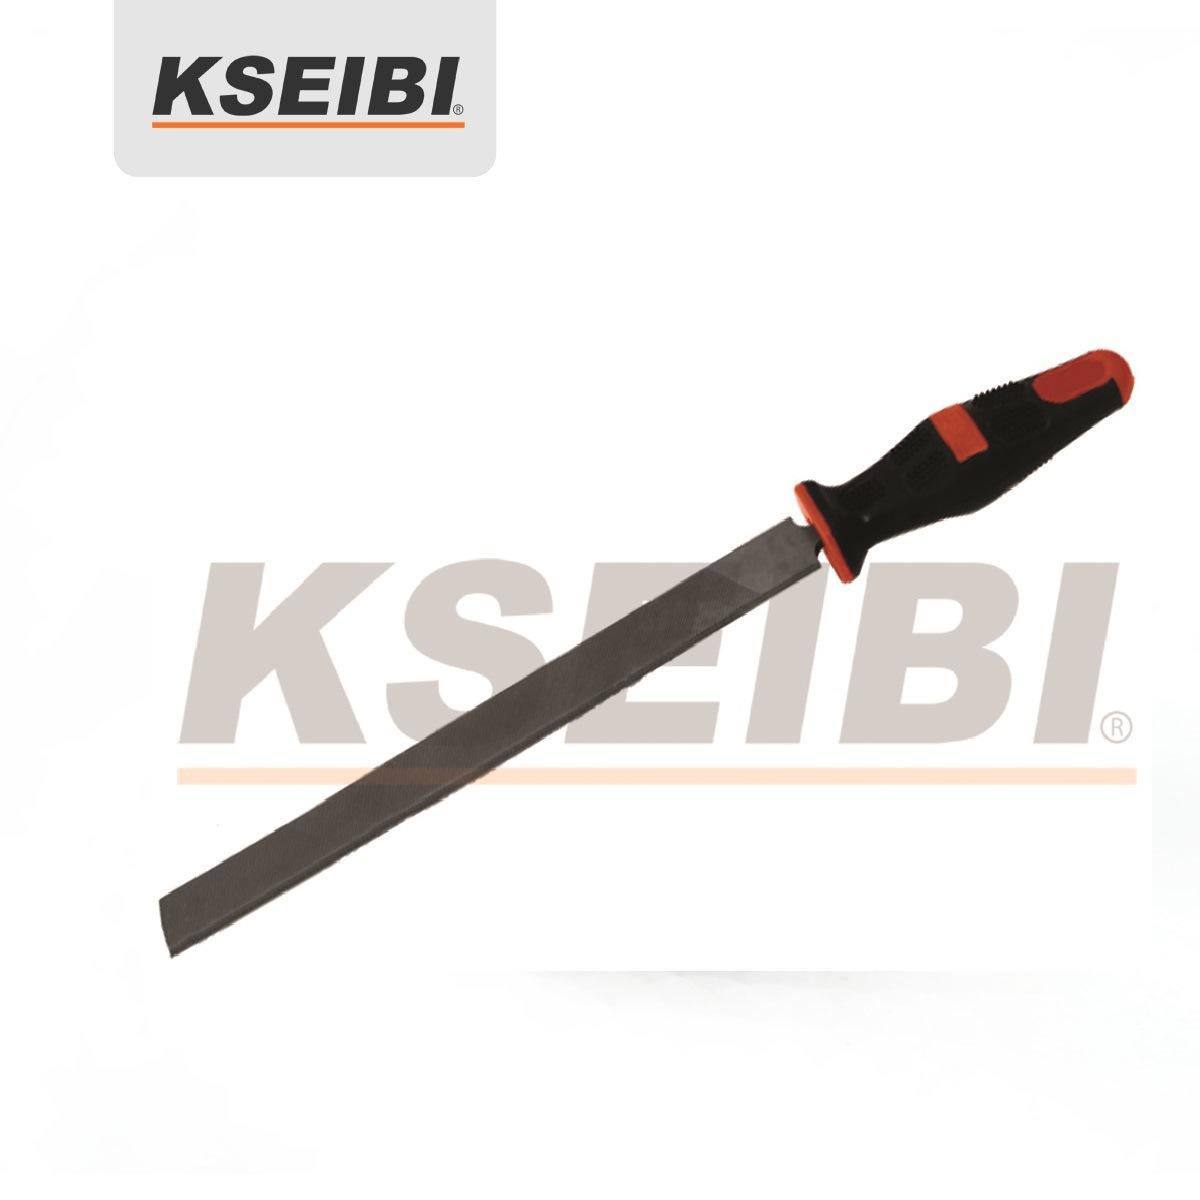 Abrasive Hand Tool Kseibi Steel Half Round Files with Handle